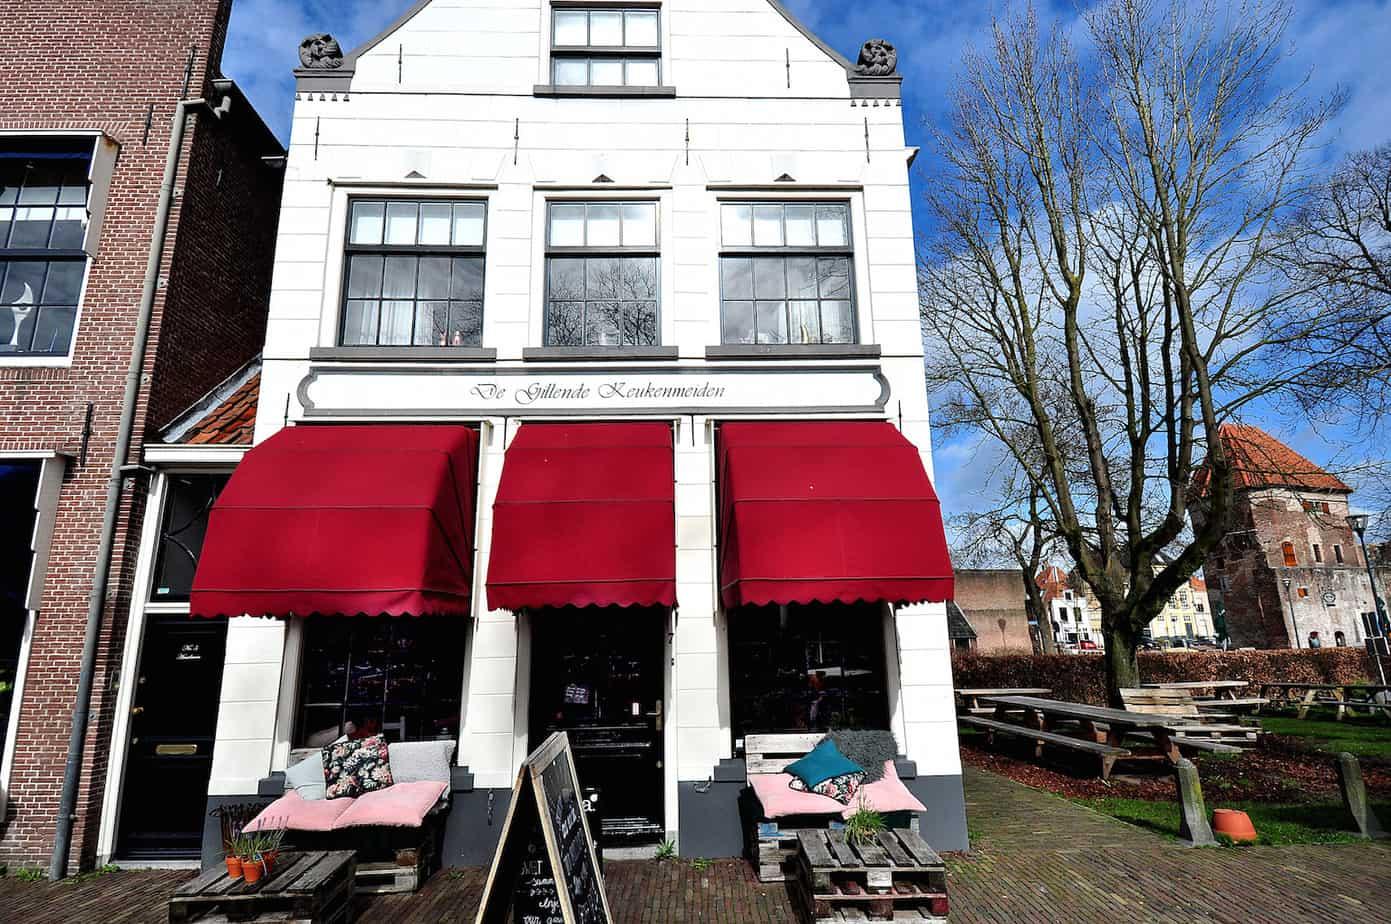 De Gillende Keukenmeiden, Zwolle